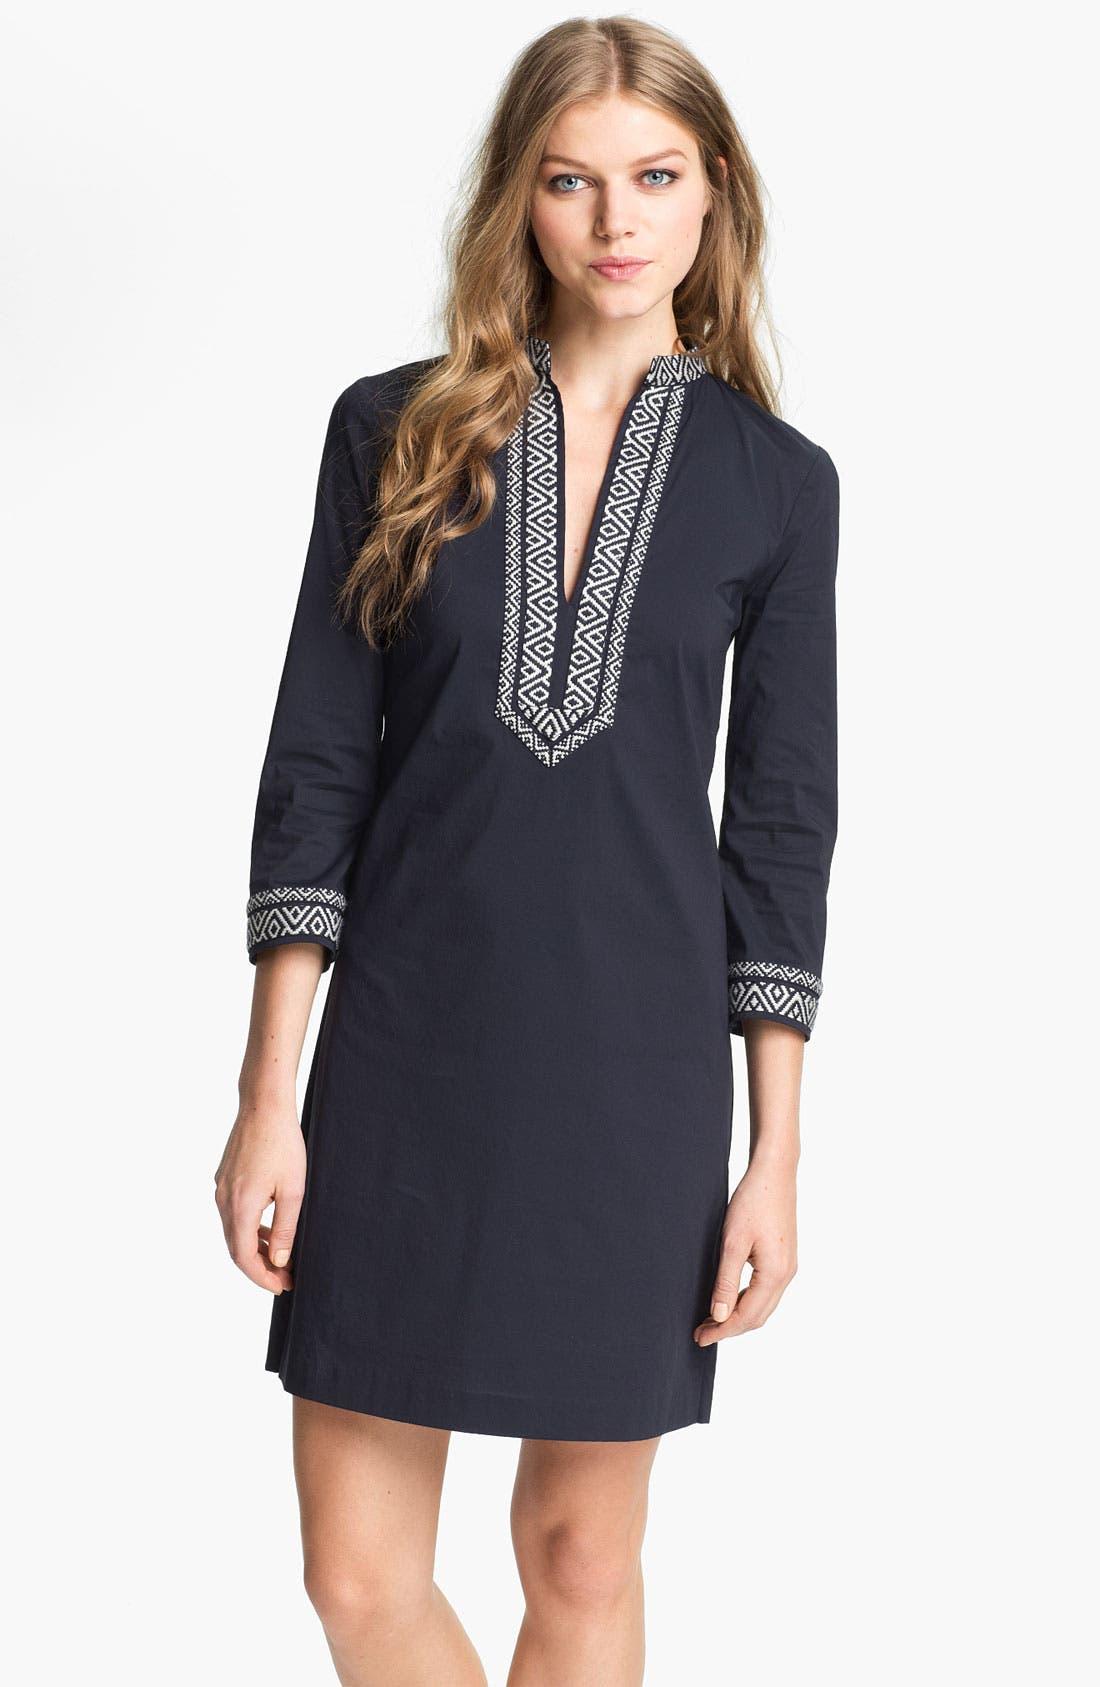 Alternate Image 1 Selected - Tory Burch Poplin Shift Dress